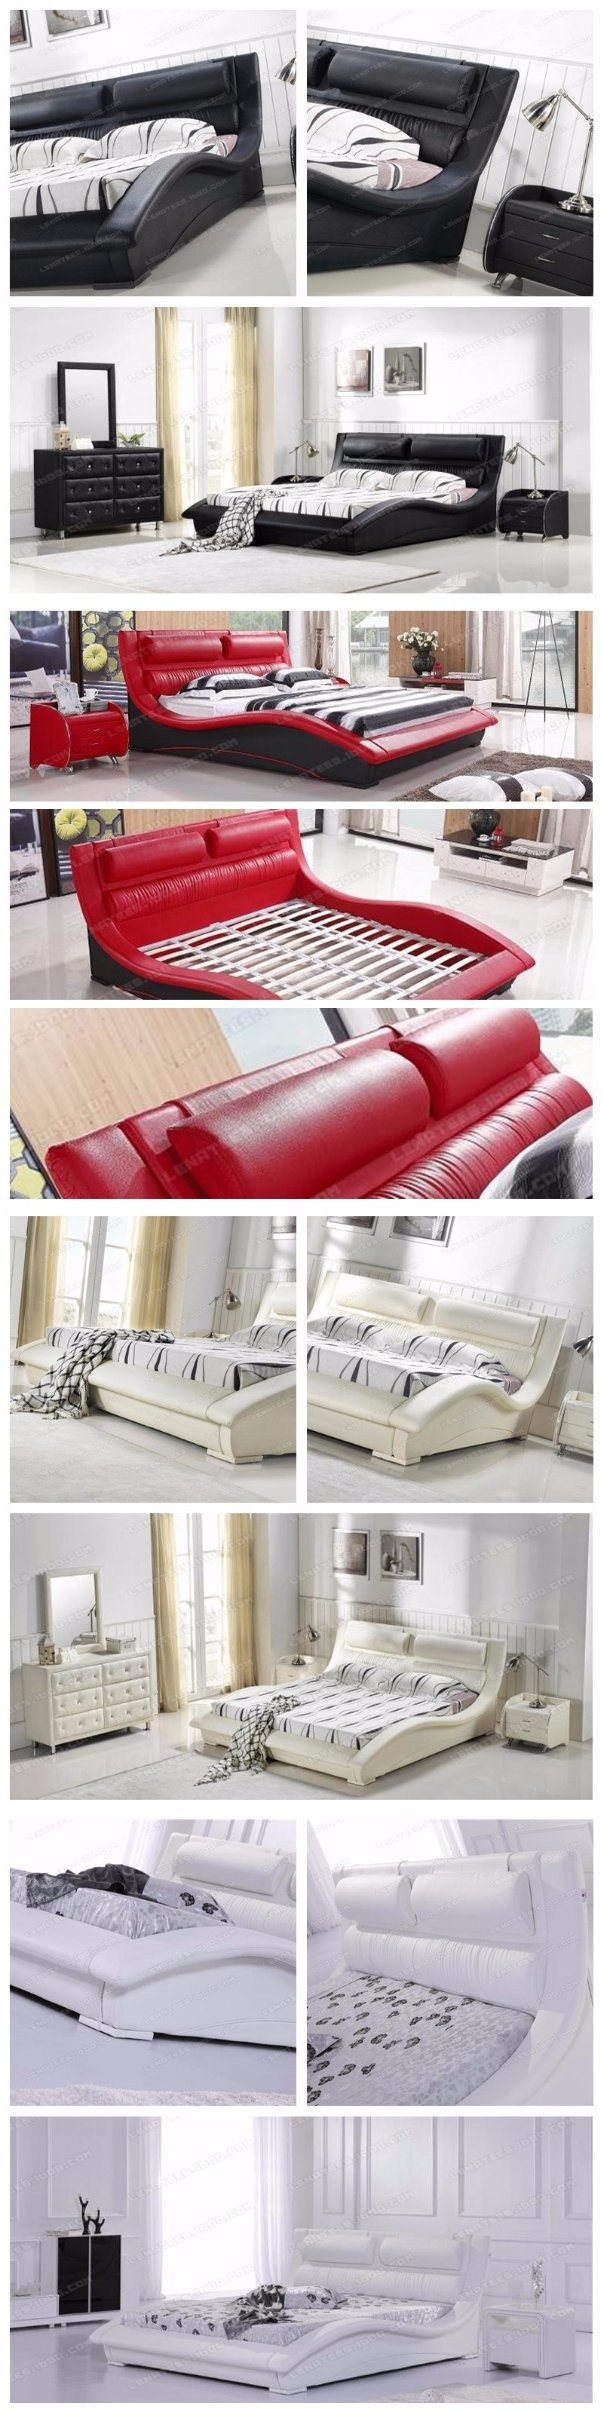 Un042 Europa moderna cama suave cuero de tamaño King Size – Un042 ...